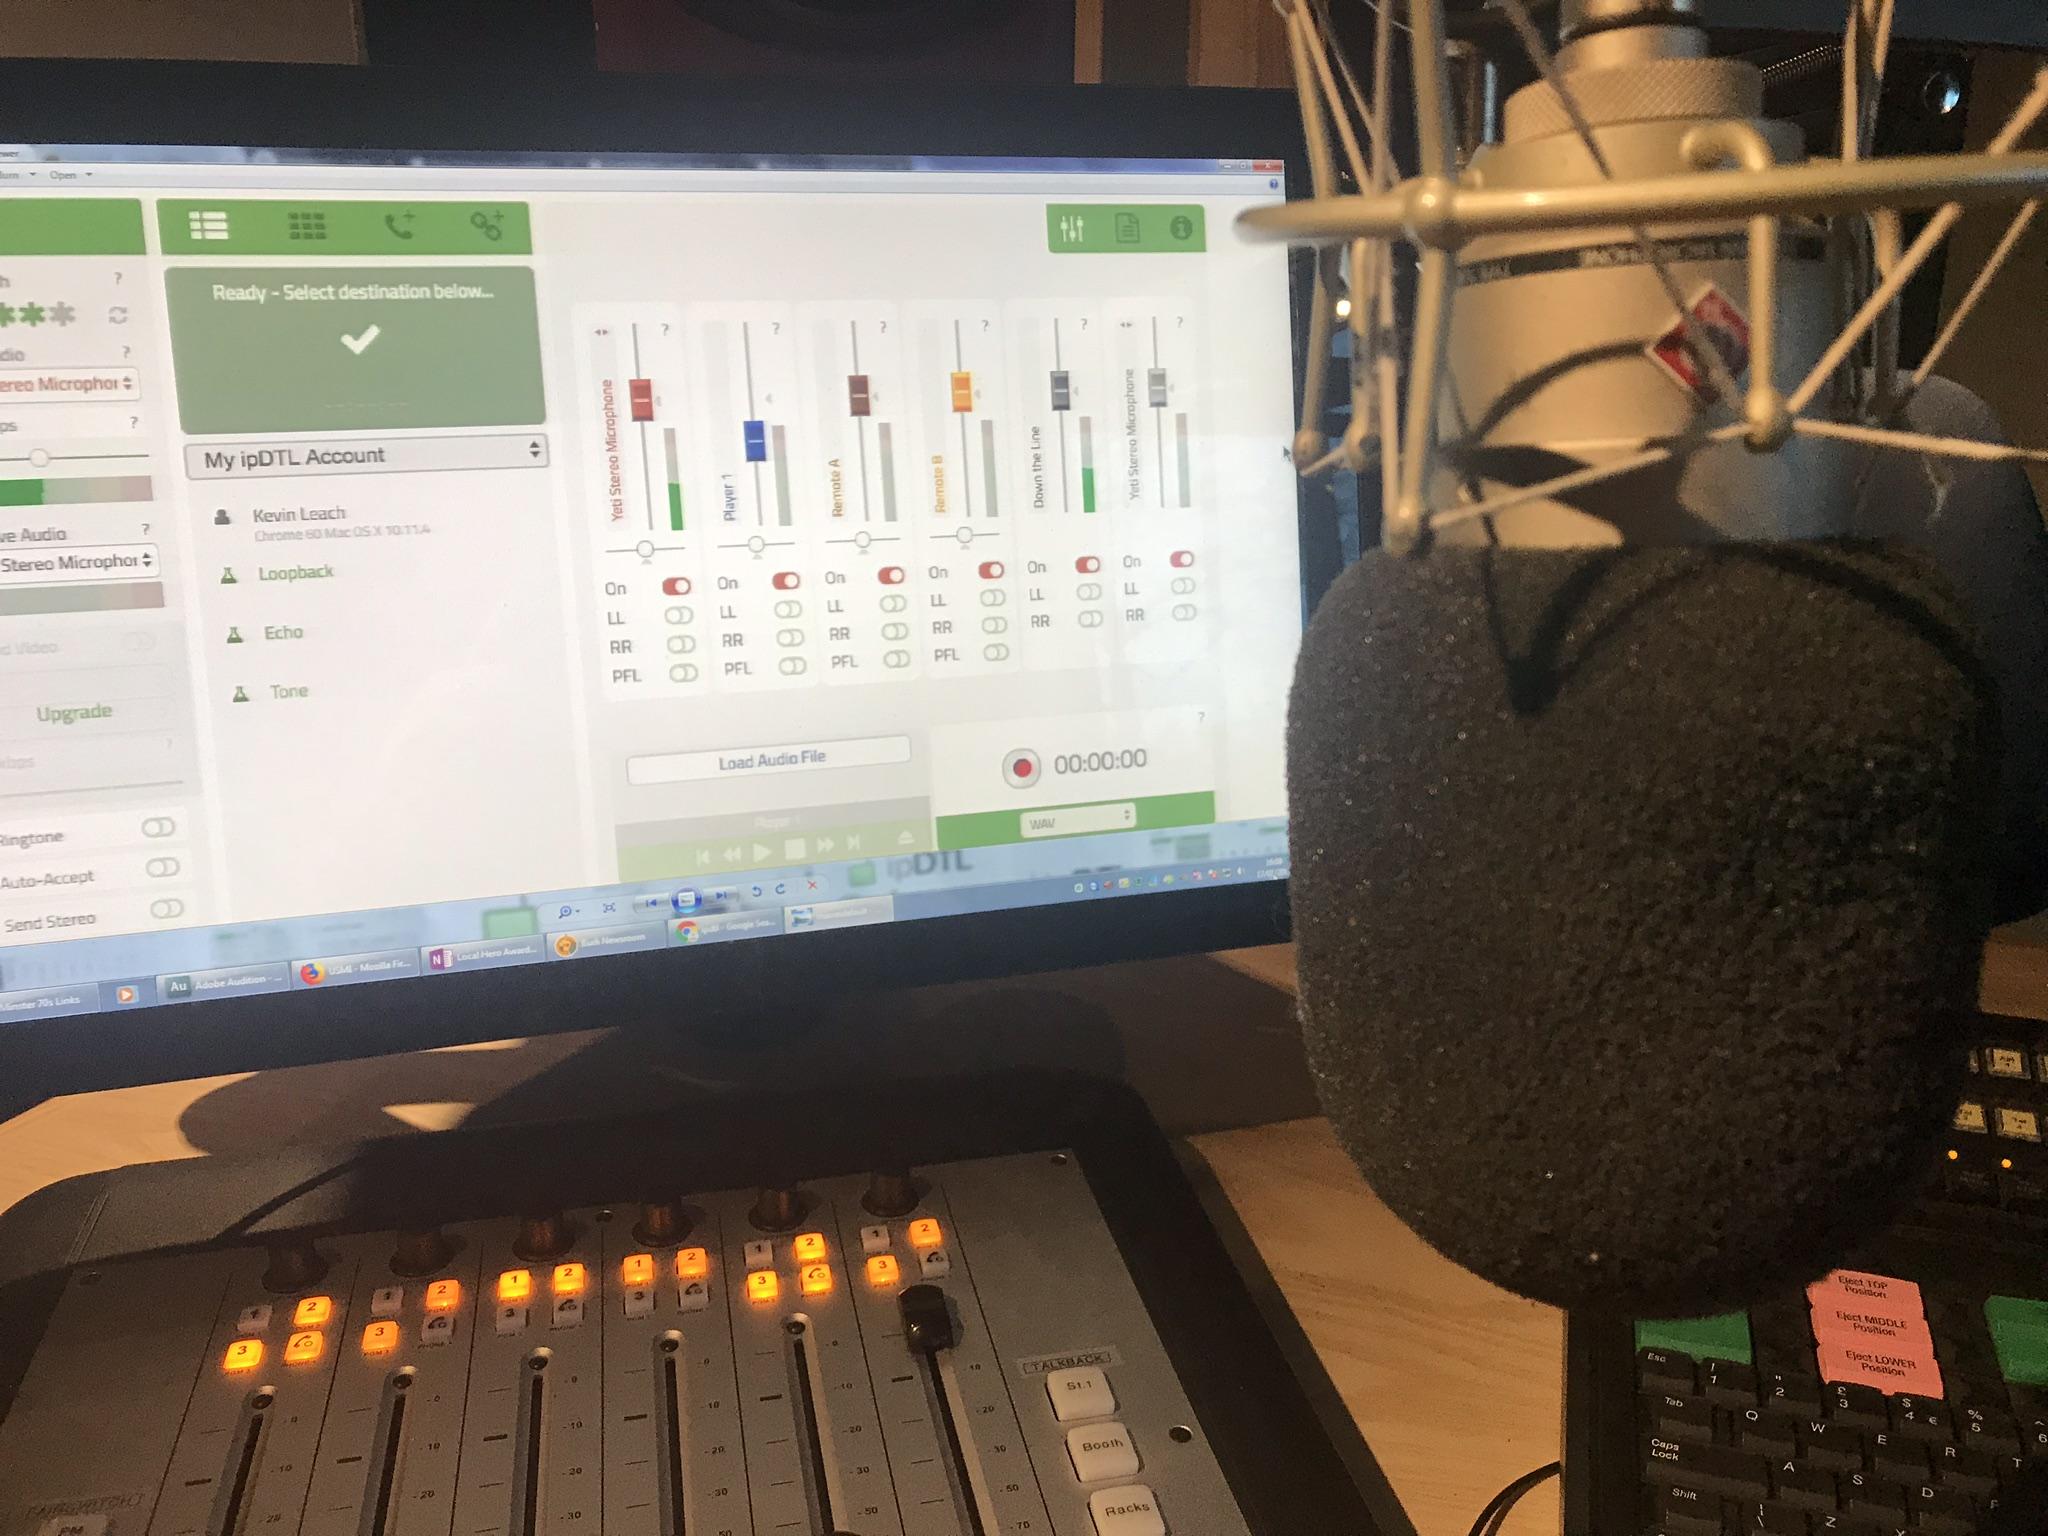 IPDTL in a radio studio environment